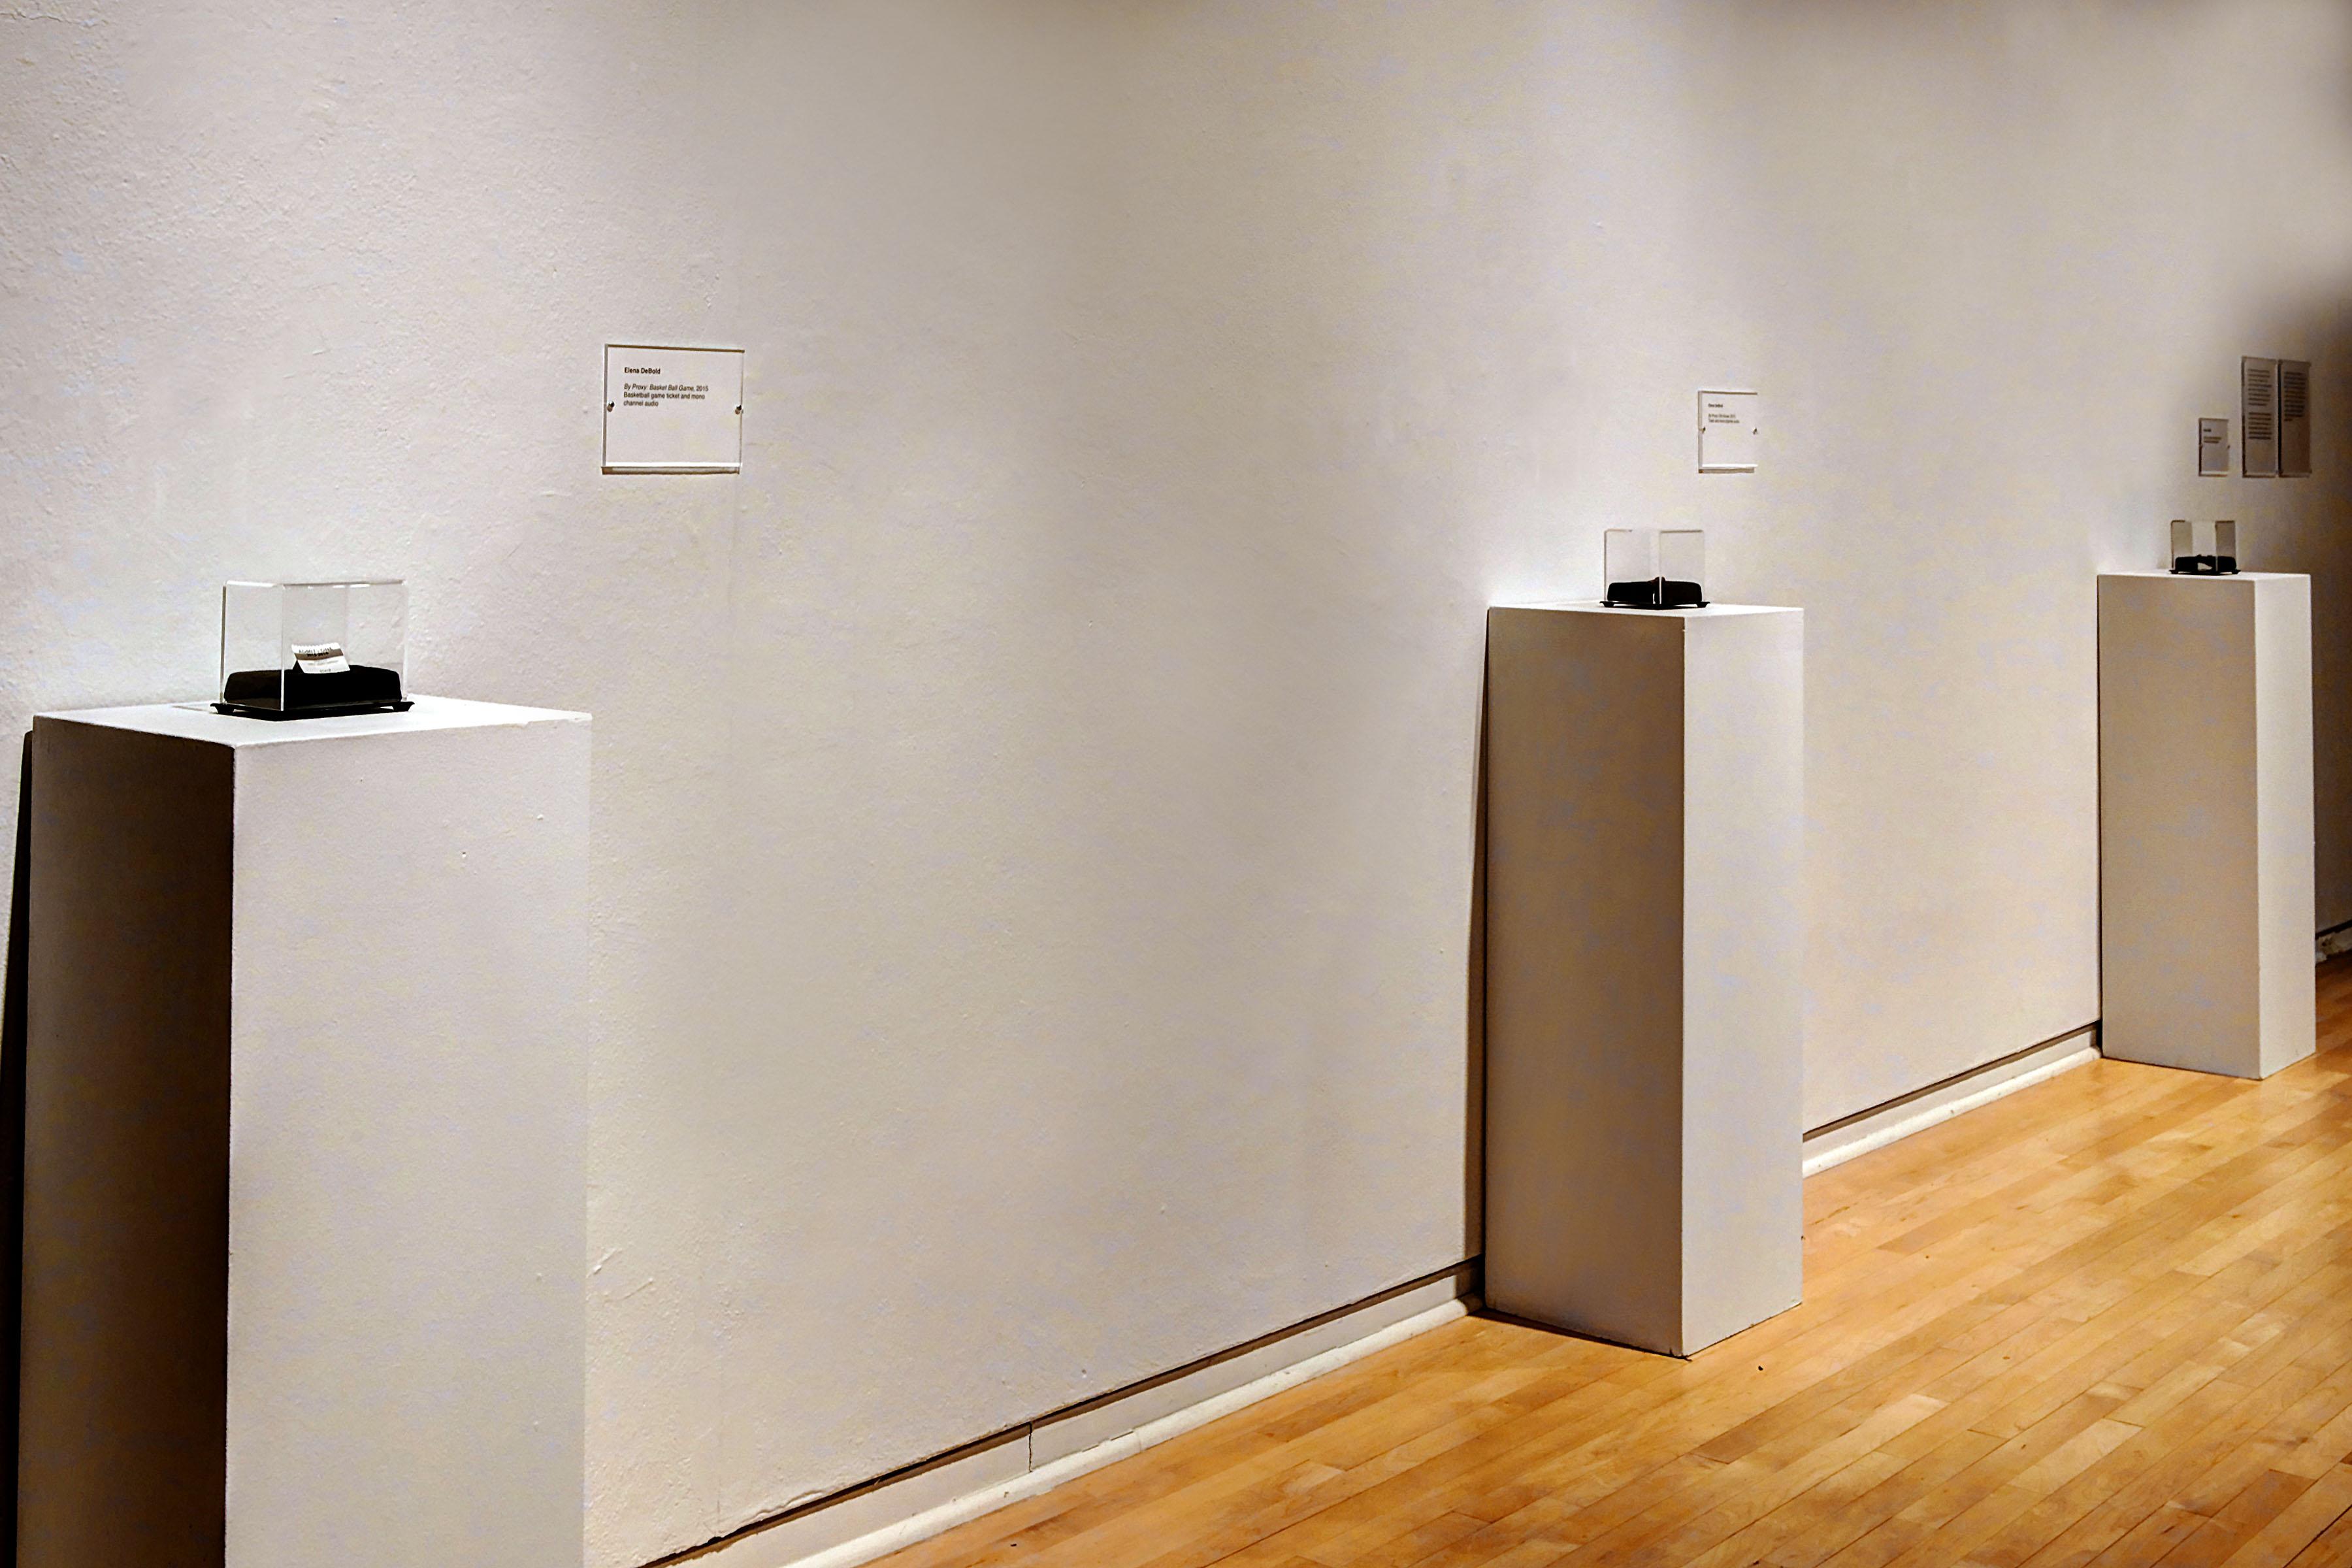 Elena_DeBold_Extra_Thesis_Exhibition_images_52